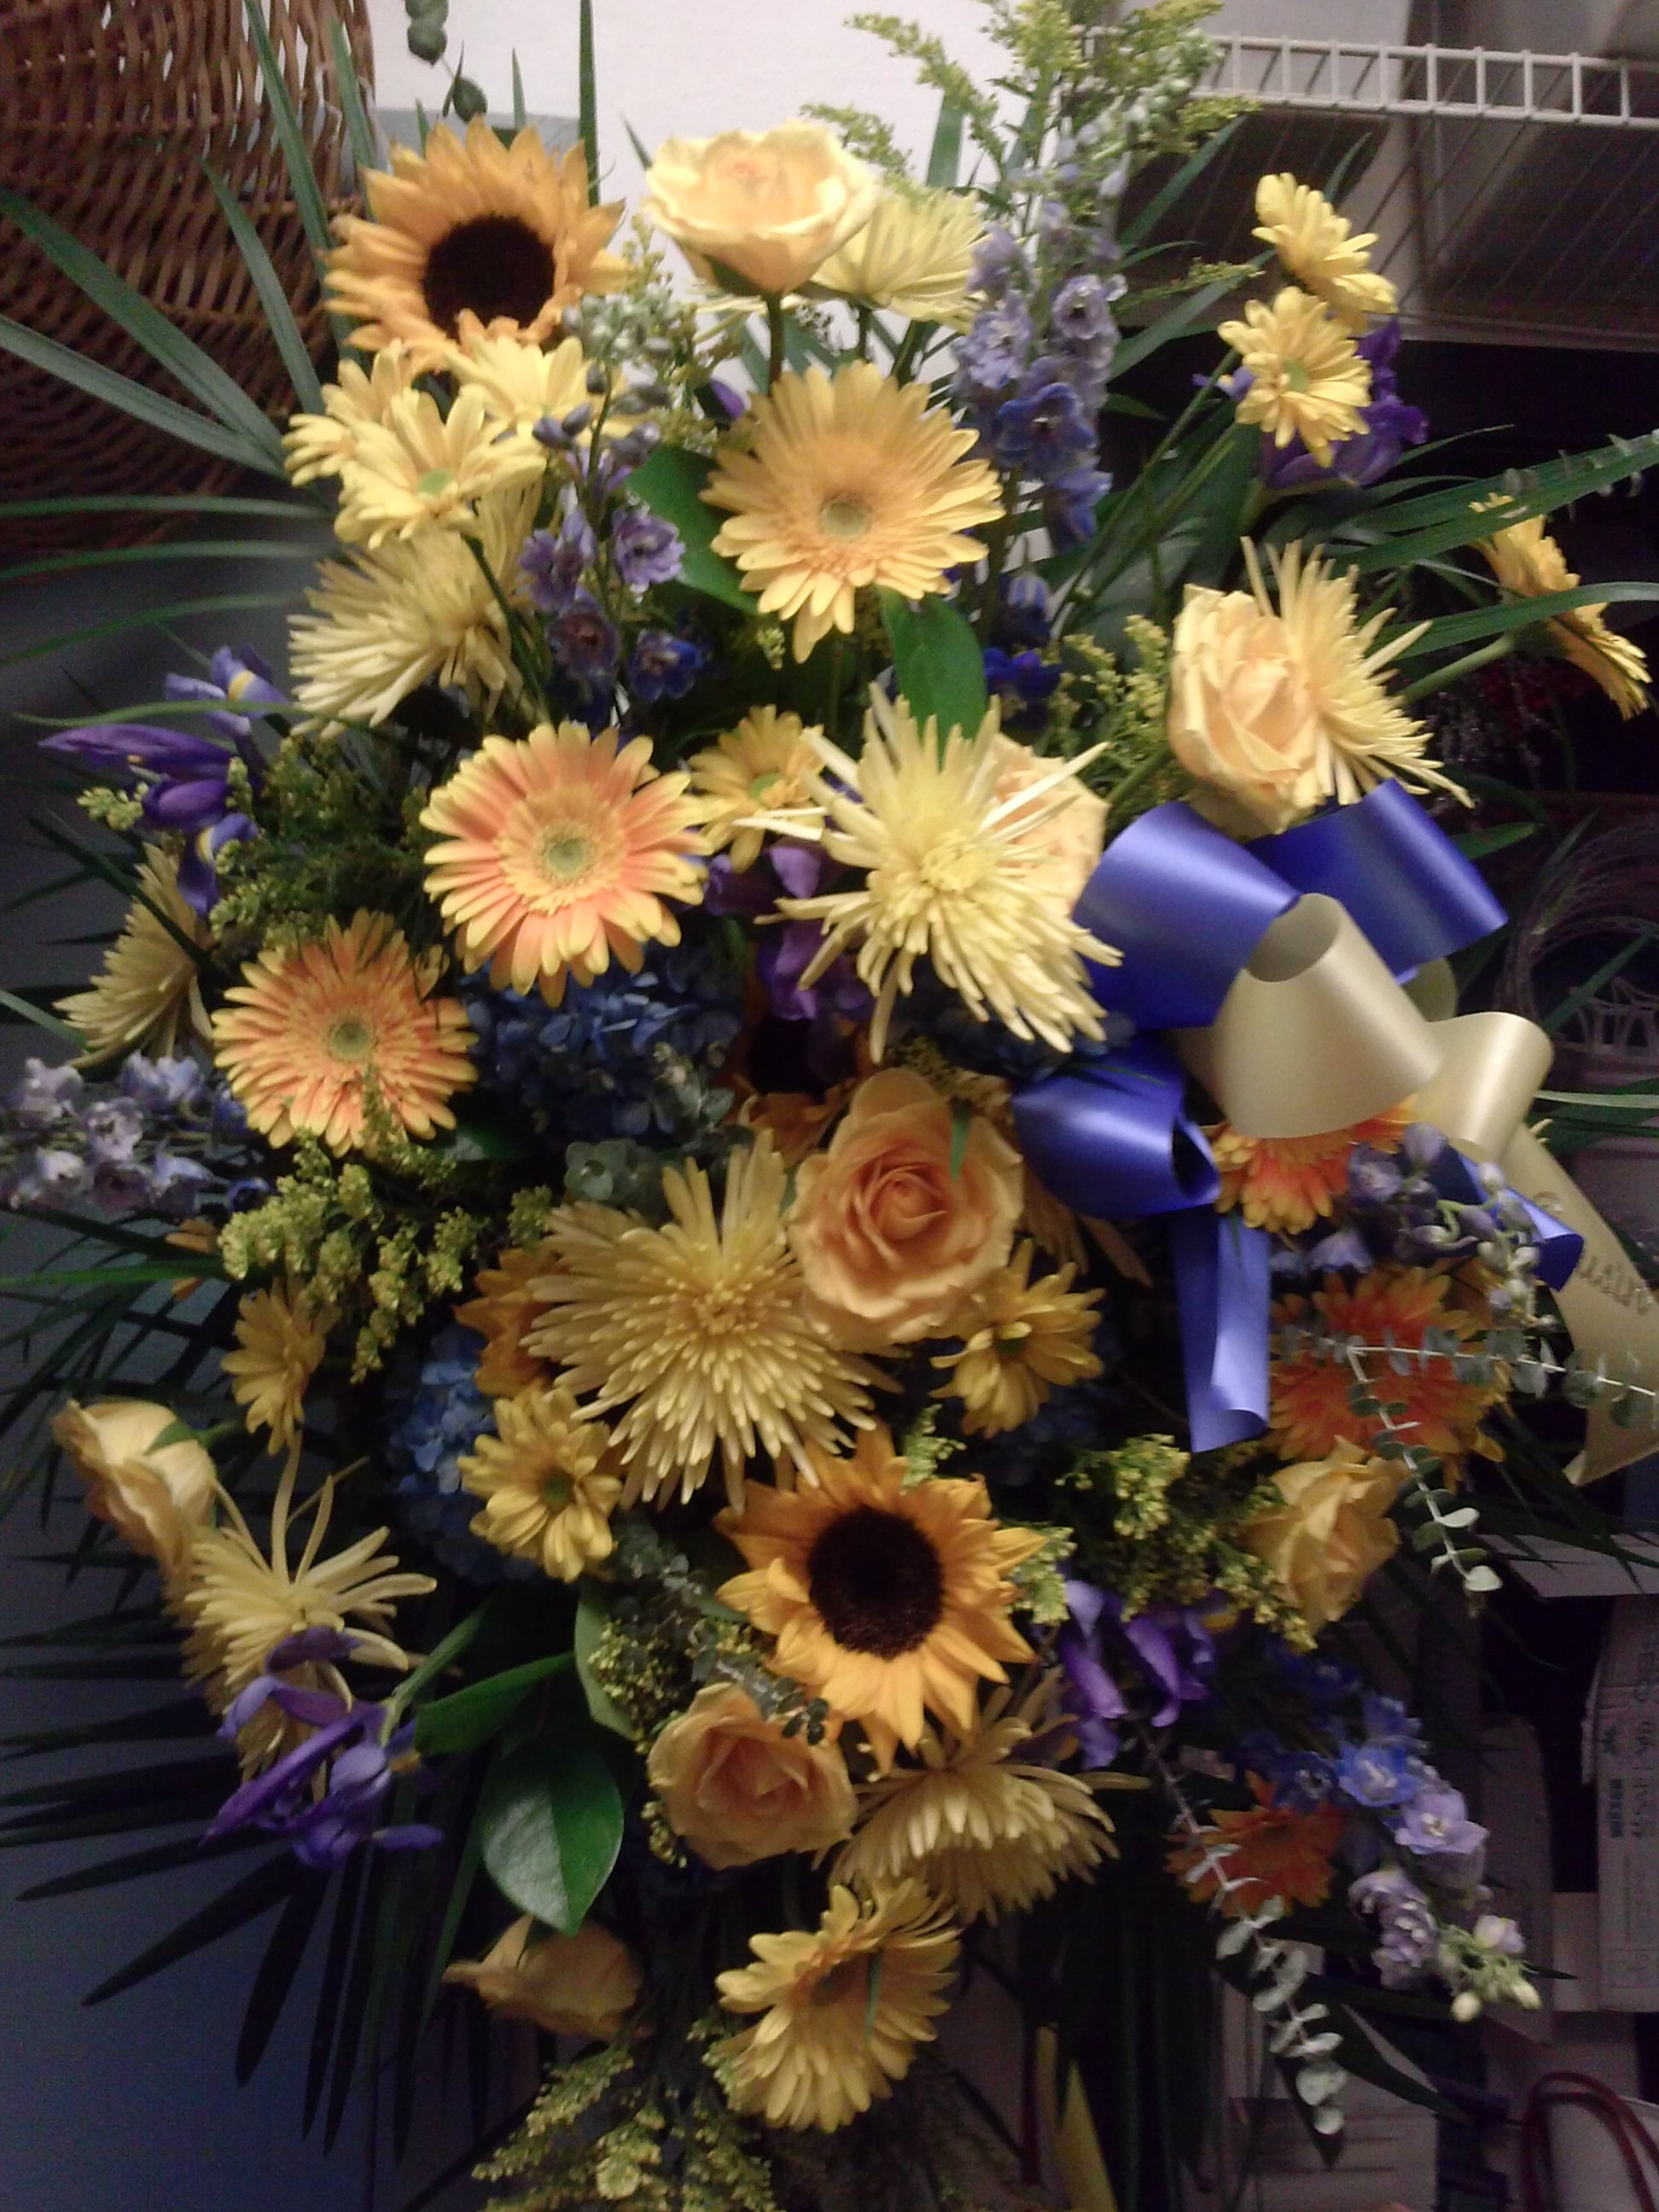 15) Gerbera, Mums, Sunflowers $150+